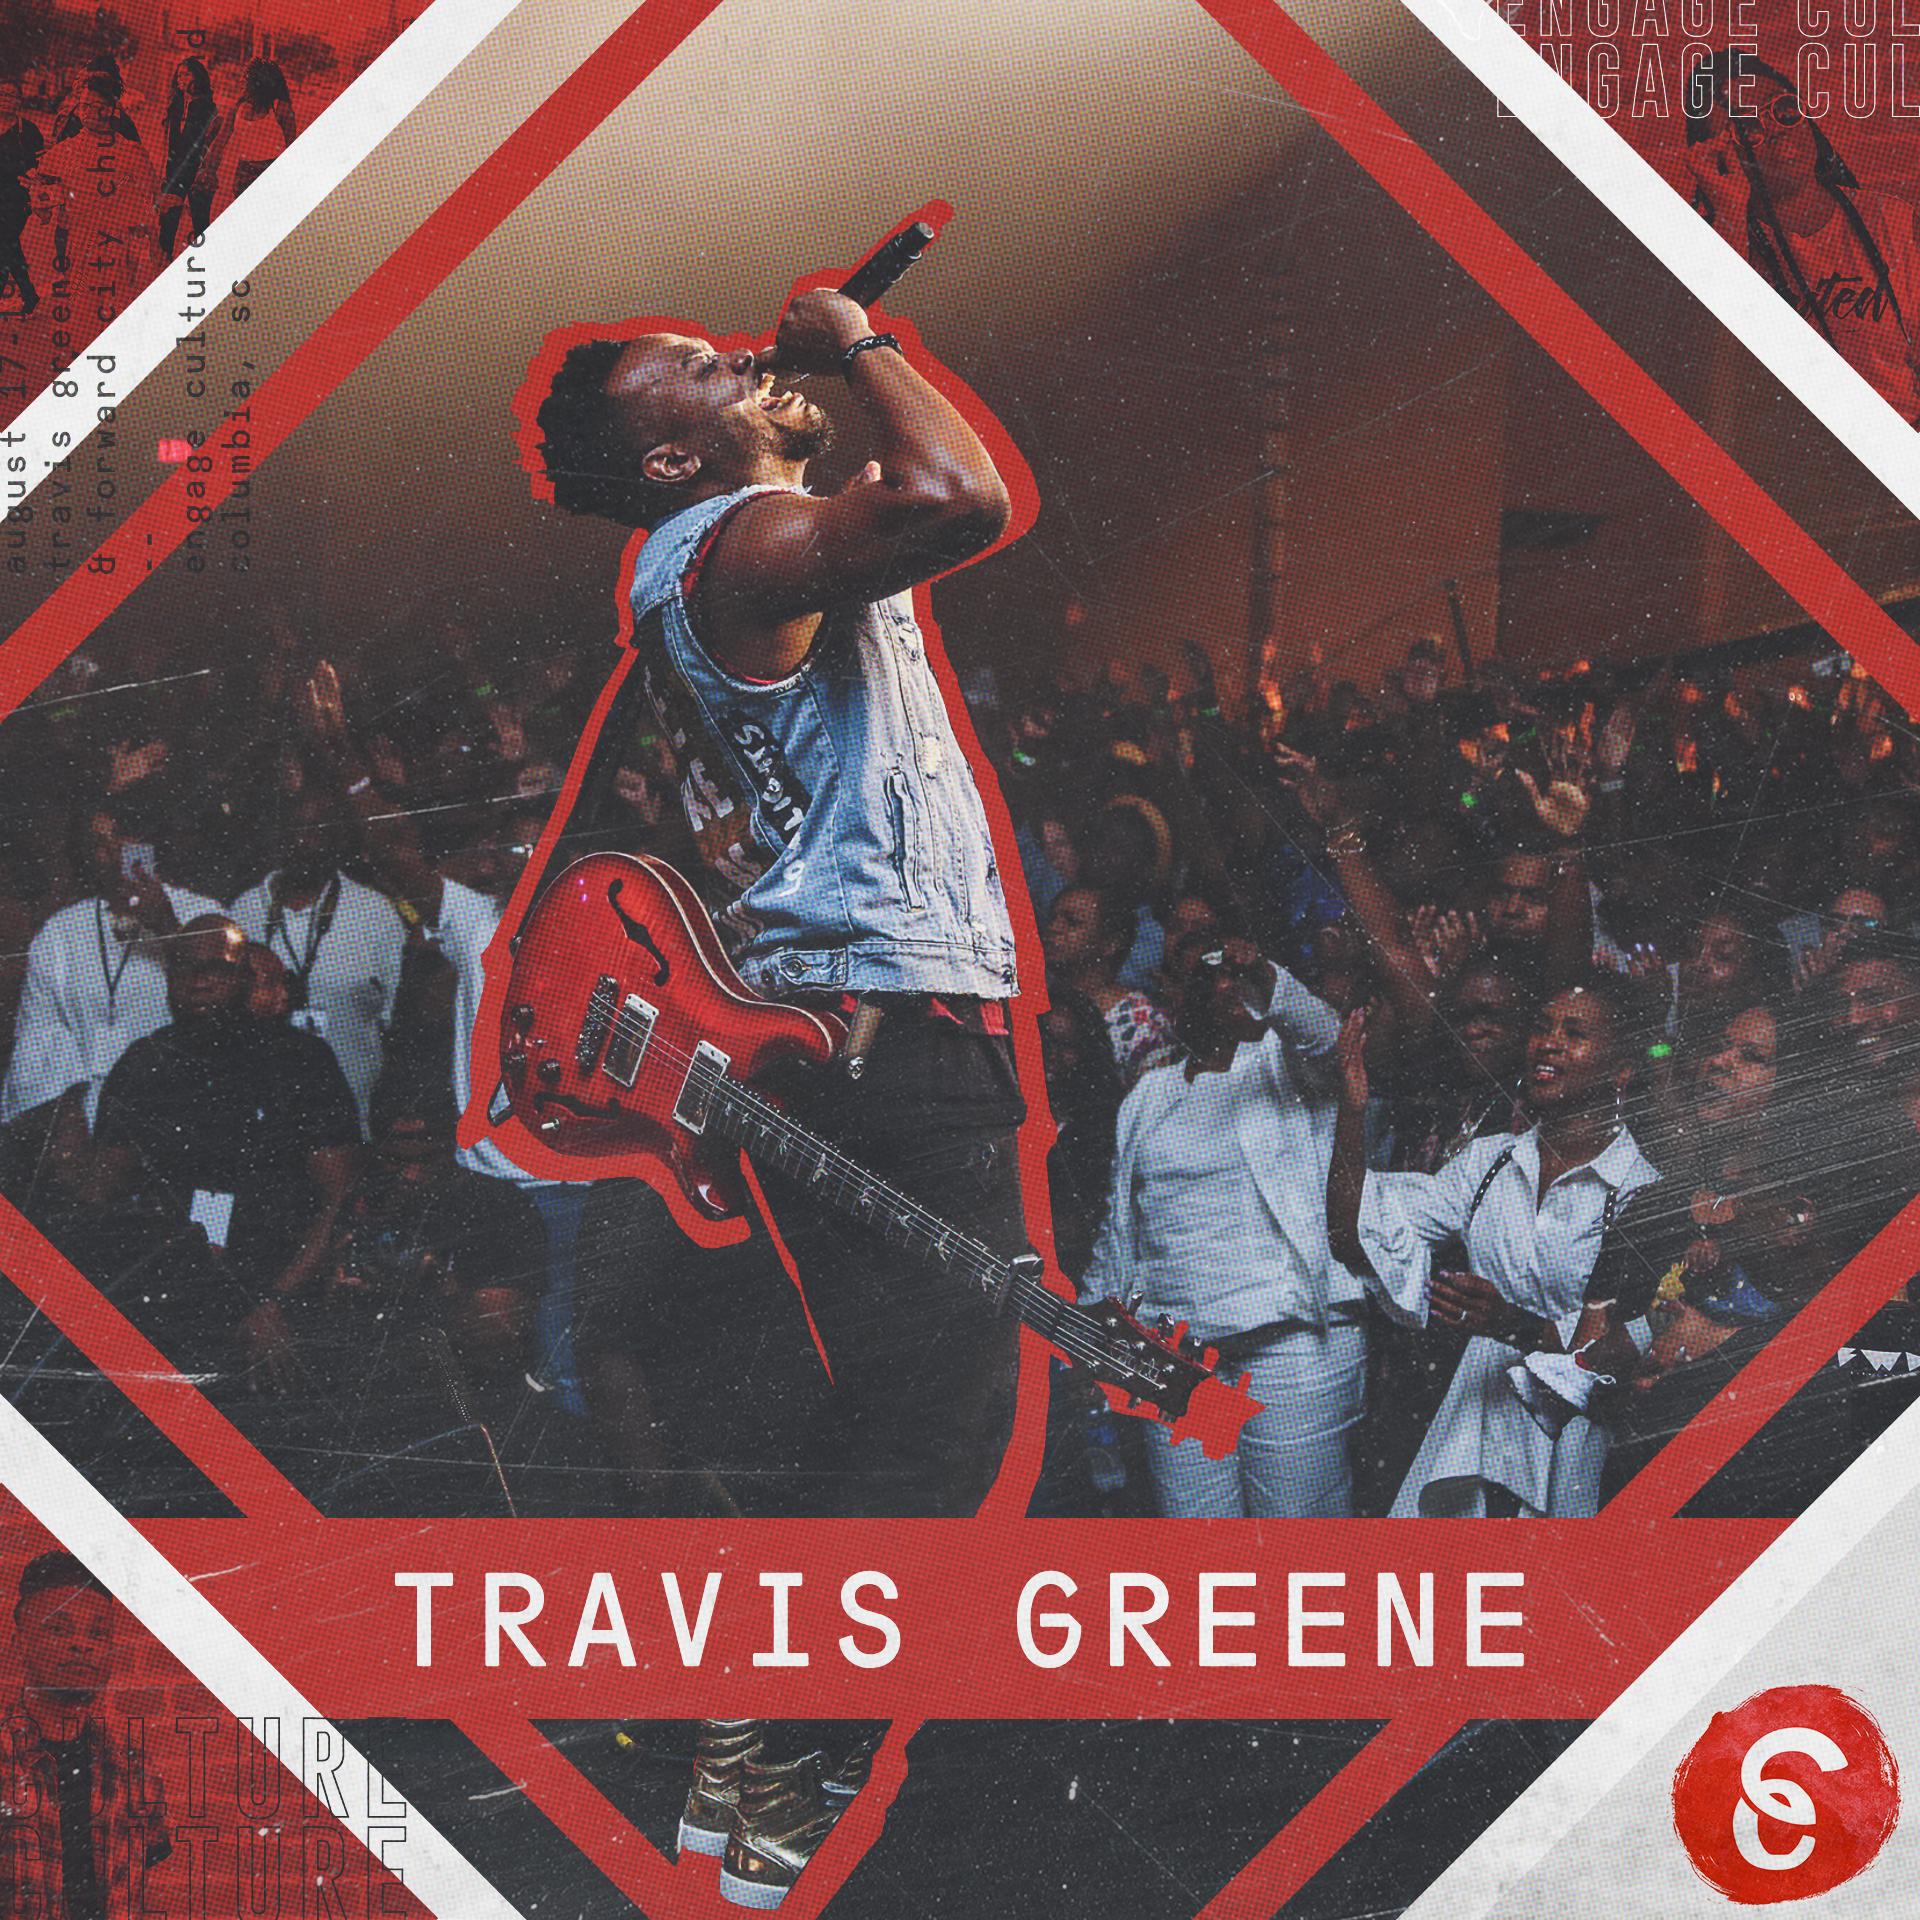 EC_1920x1920_Travis-Greenne.jpg